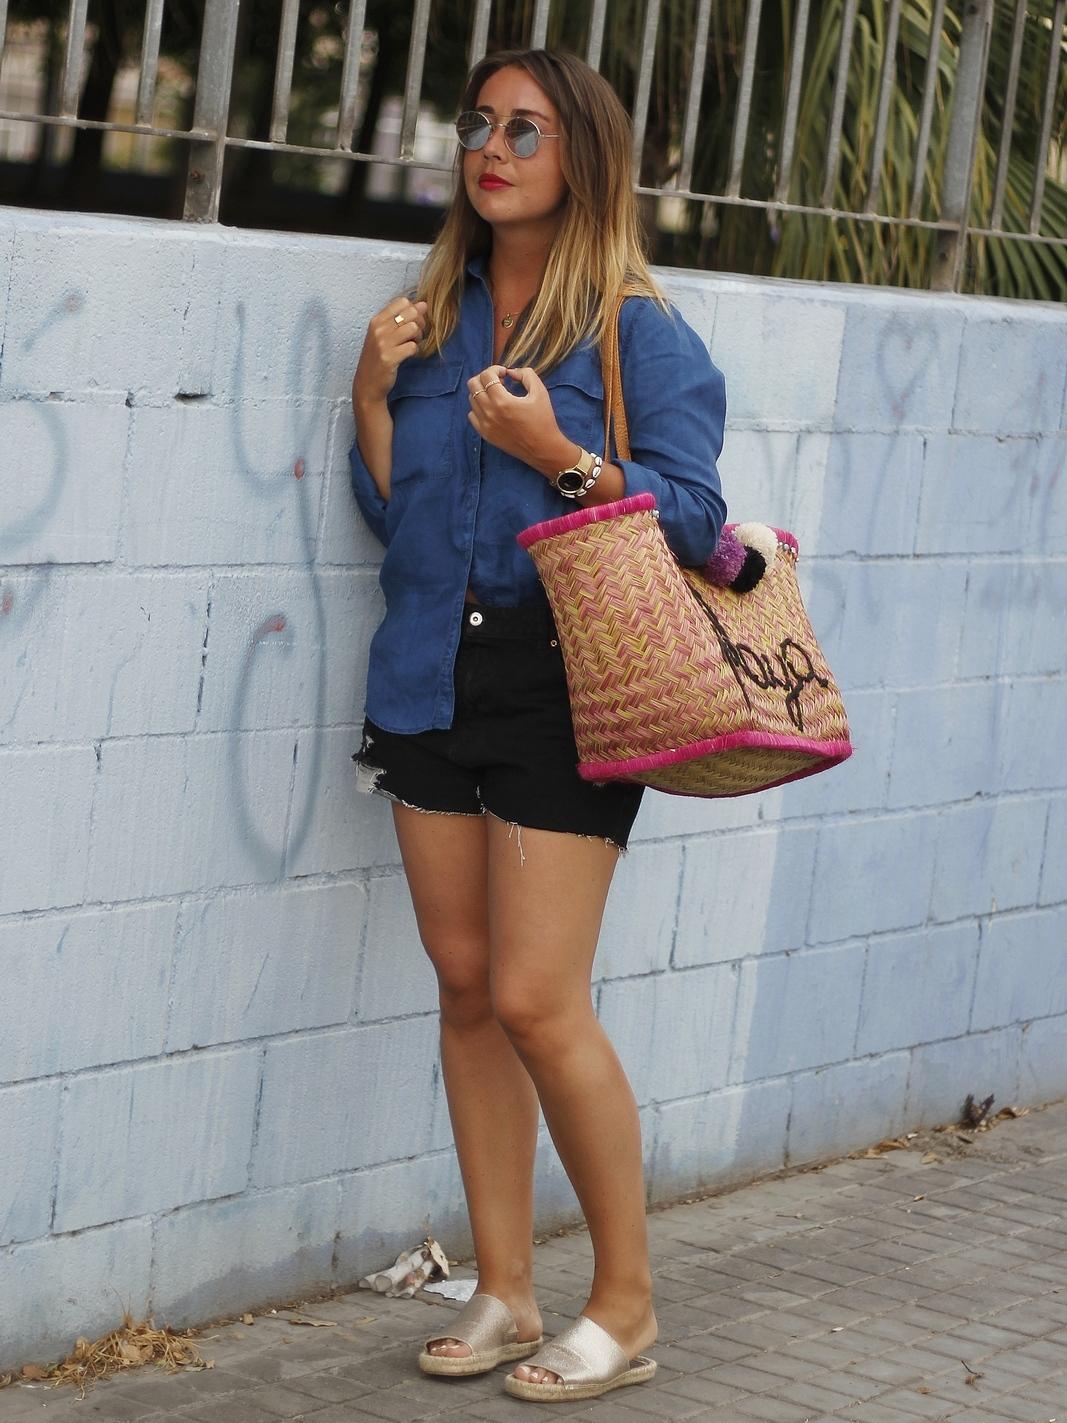 du style madame - panier osier - summer look - valencia